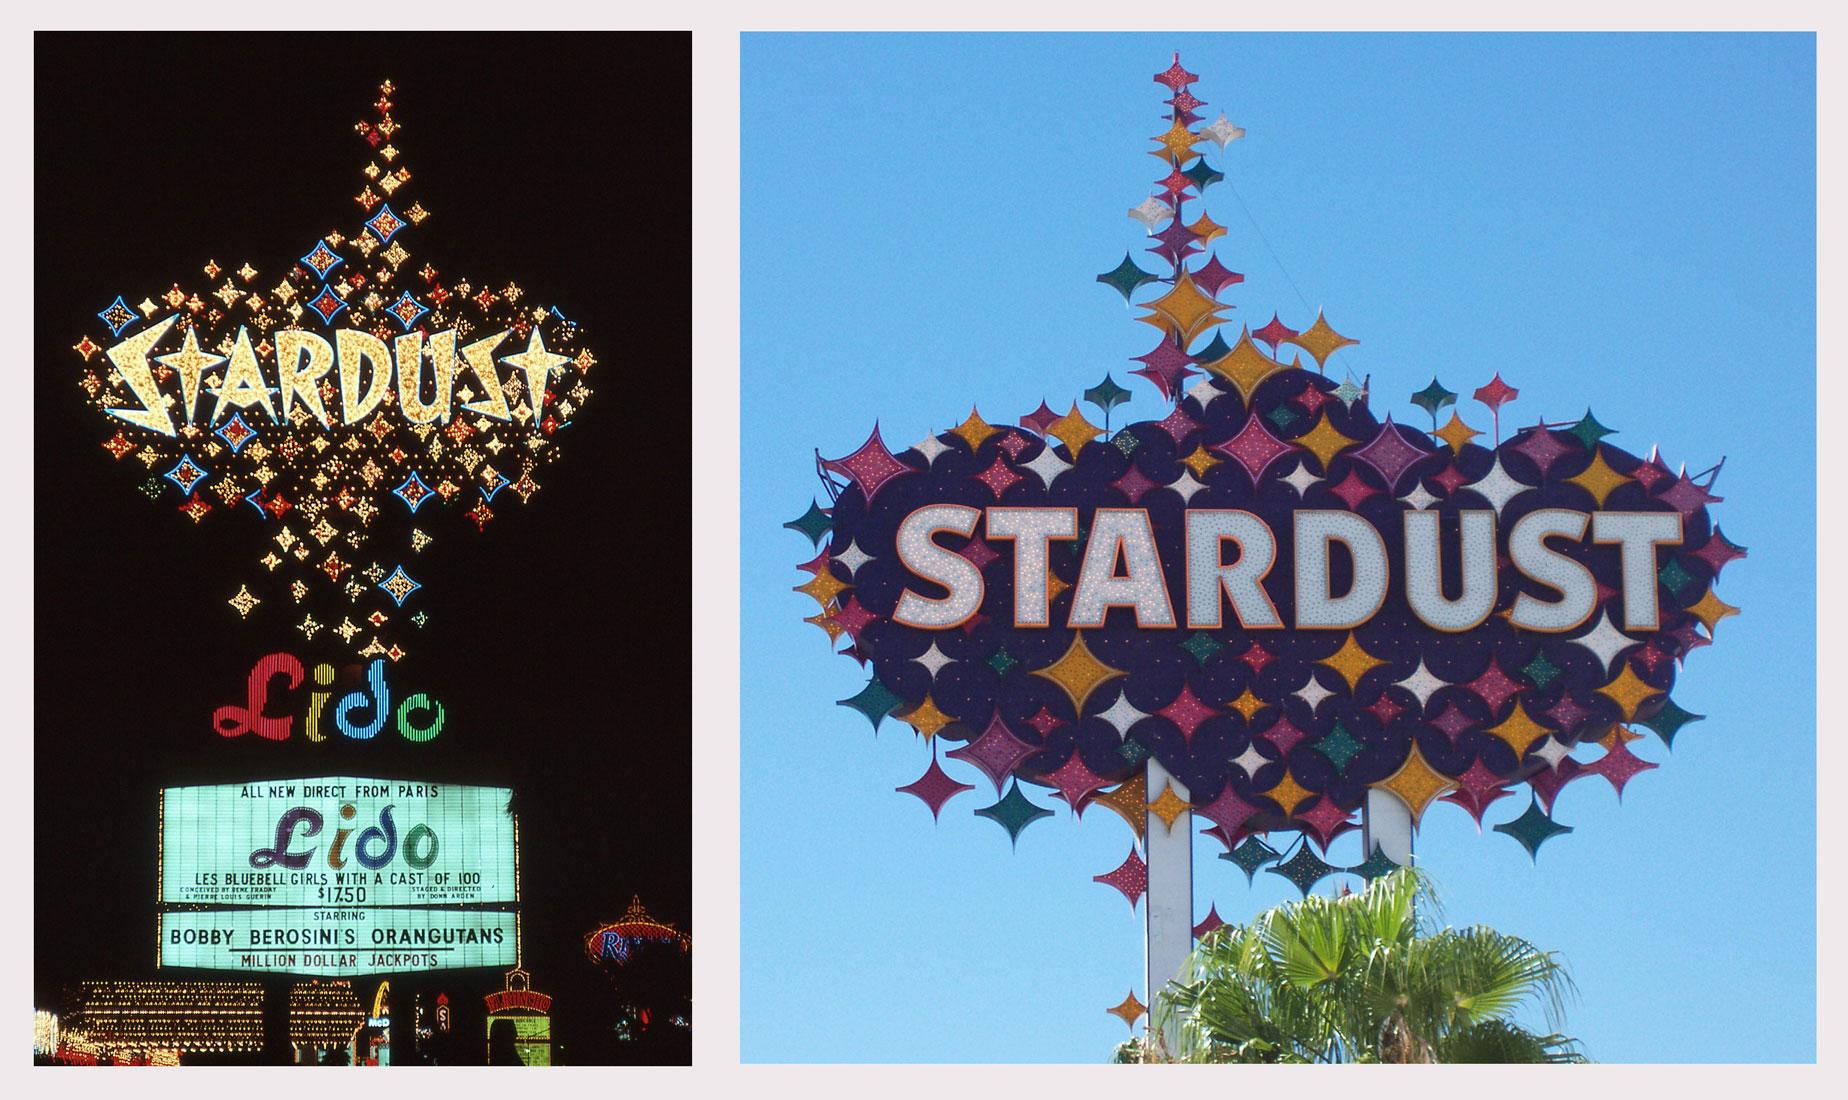 Akina stardust casino hollywood casino st louis mo location